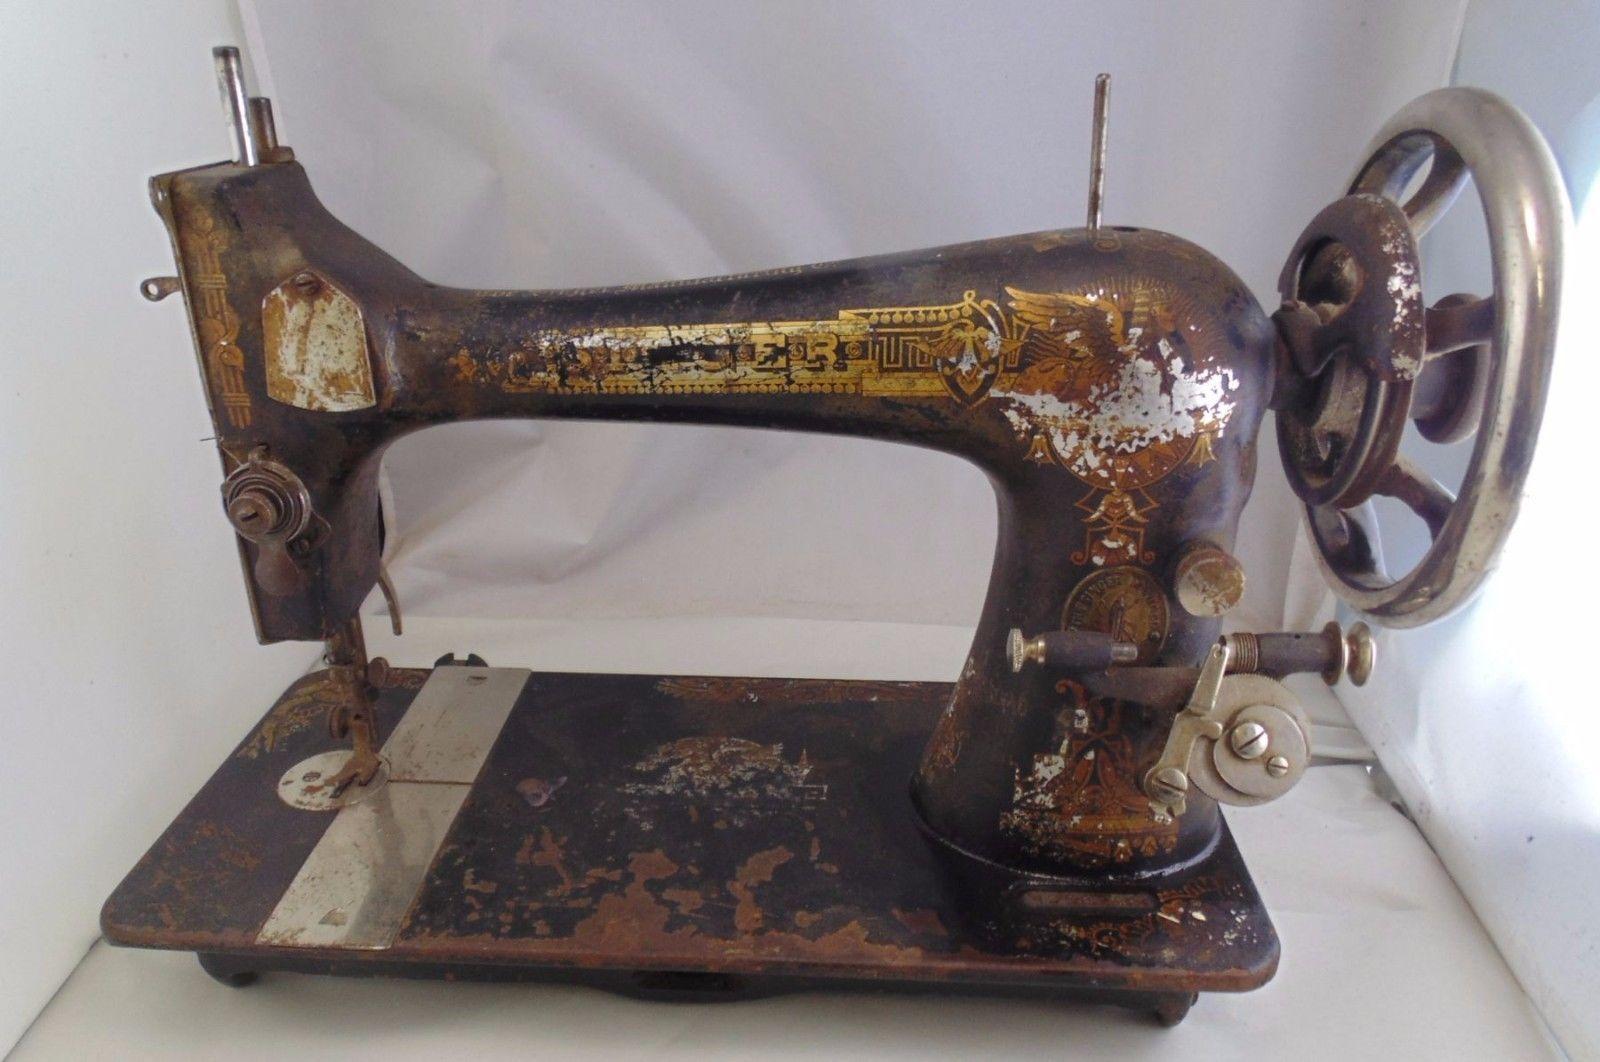 Singer Sewing Machine (1900s): 7 listings